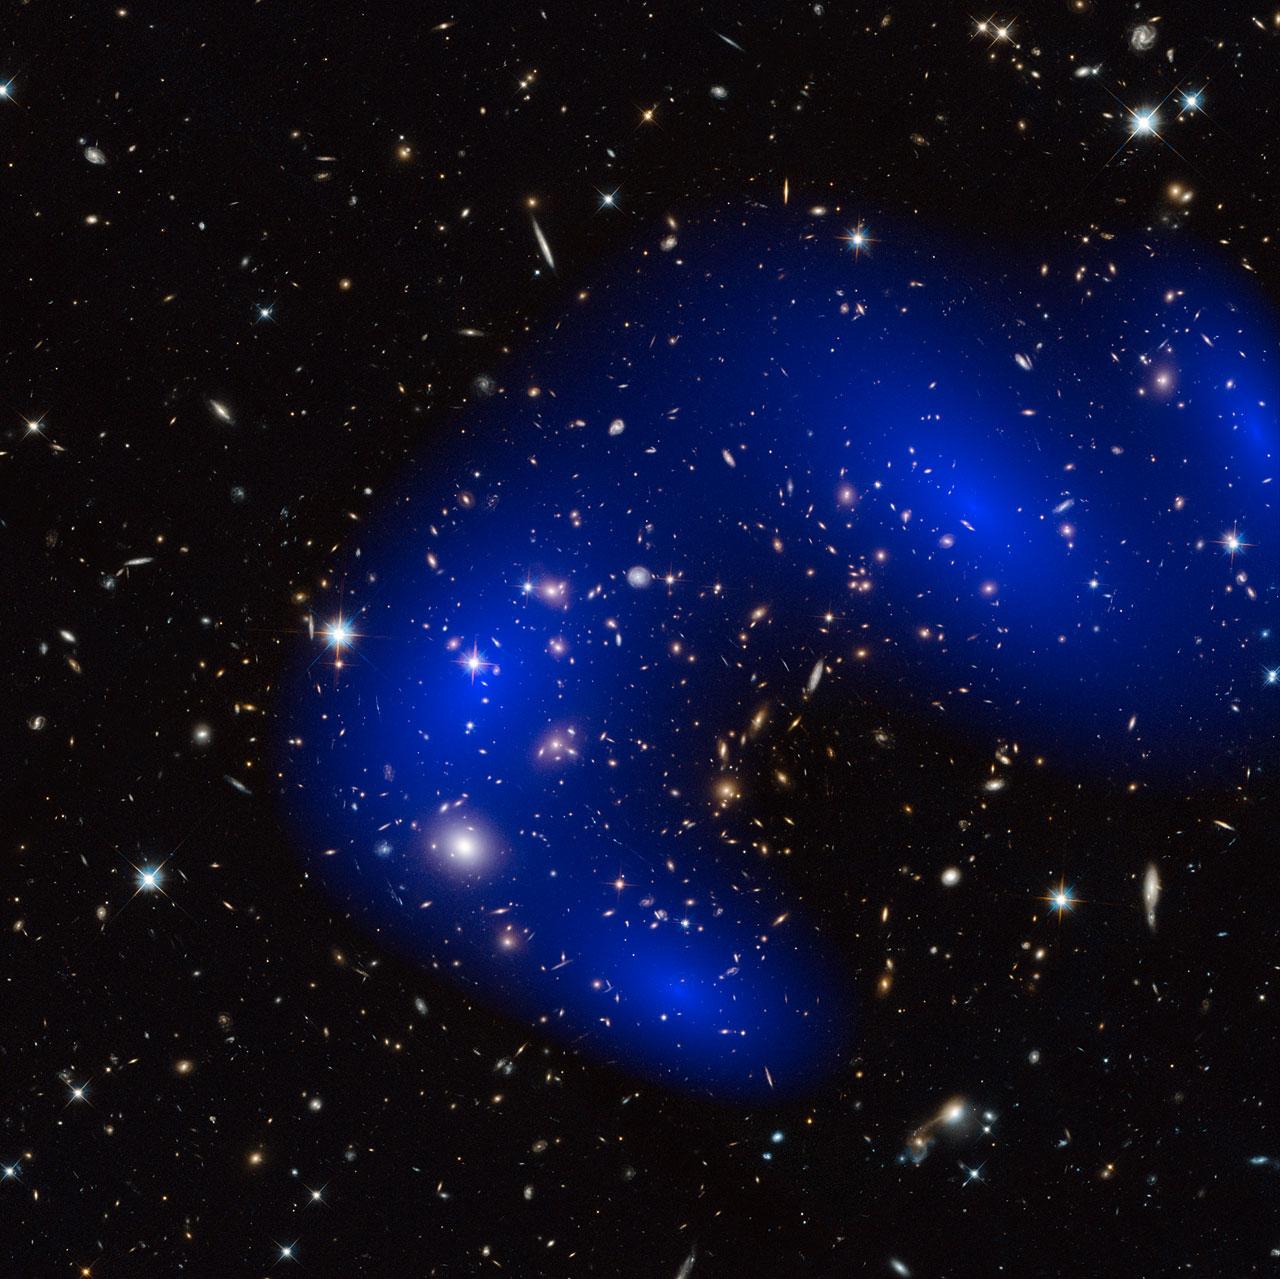 Galaxy cluster MACS J0717.5+3745 with dark matter map